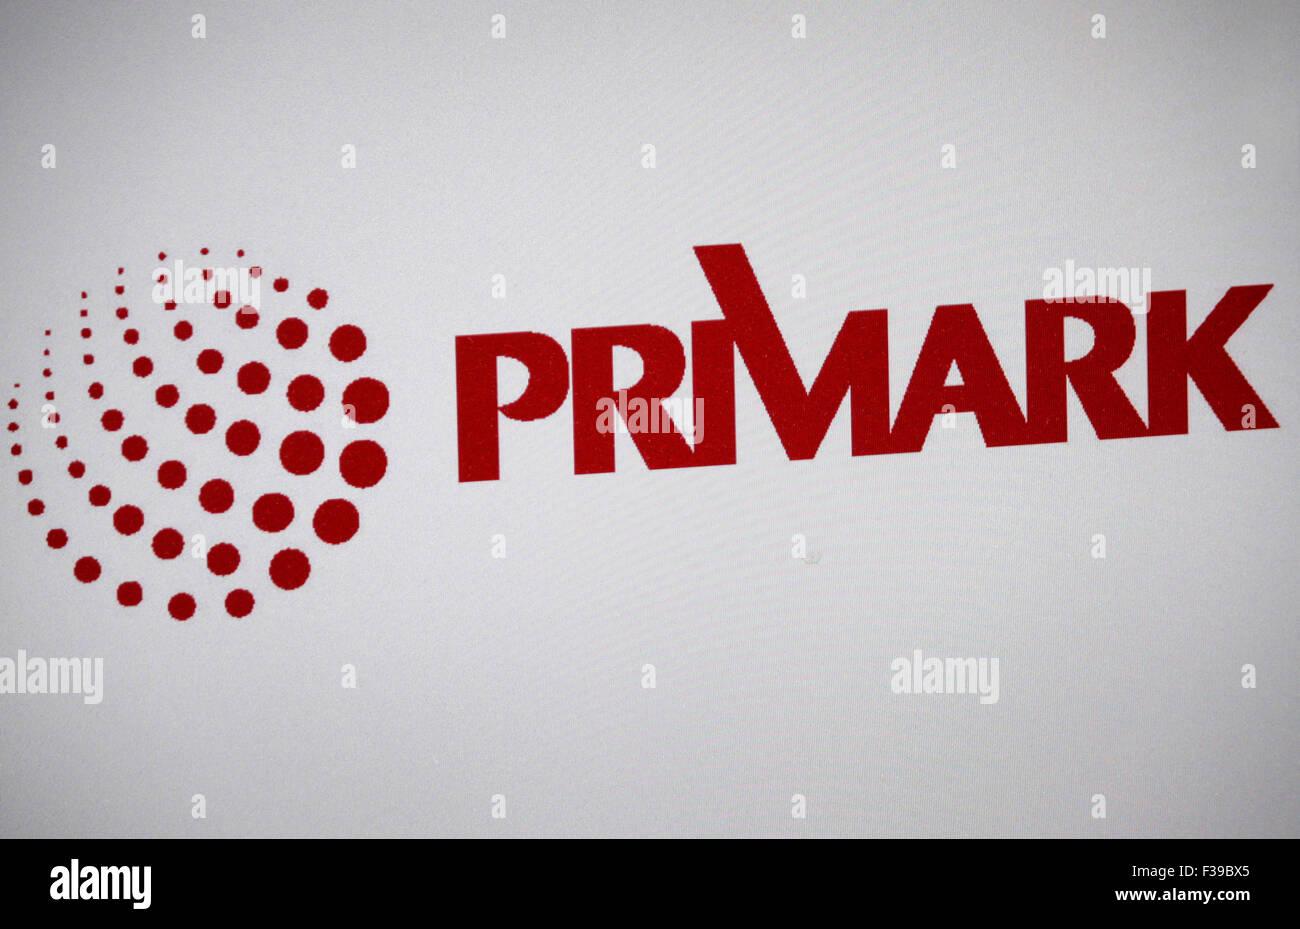 Markenname: 'Primark Corporation', Berlin. - Stock Image